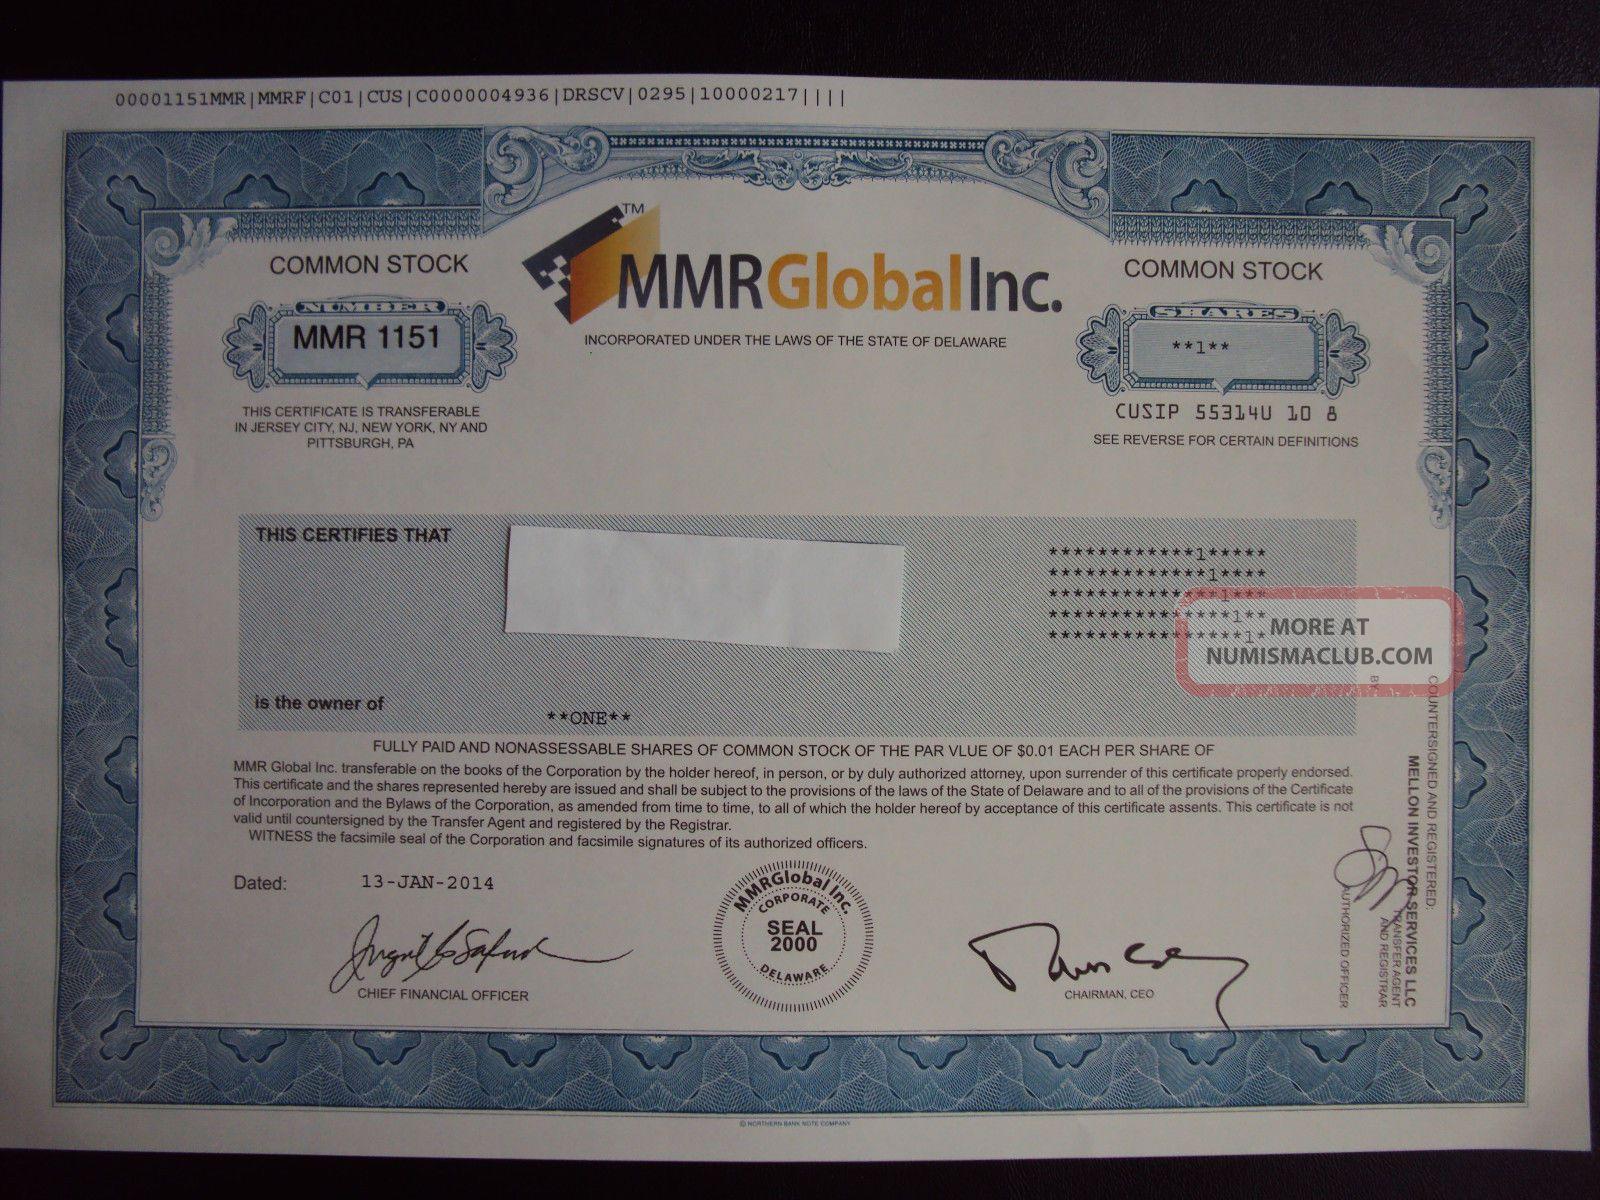 Mmr Global Stock Certificate Stocks & Bonds, Scripophily photo